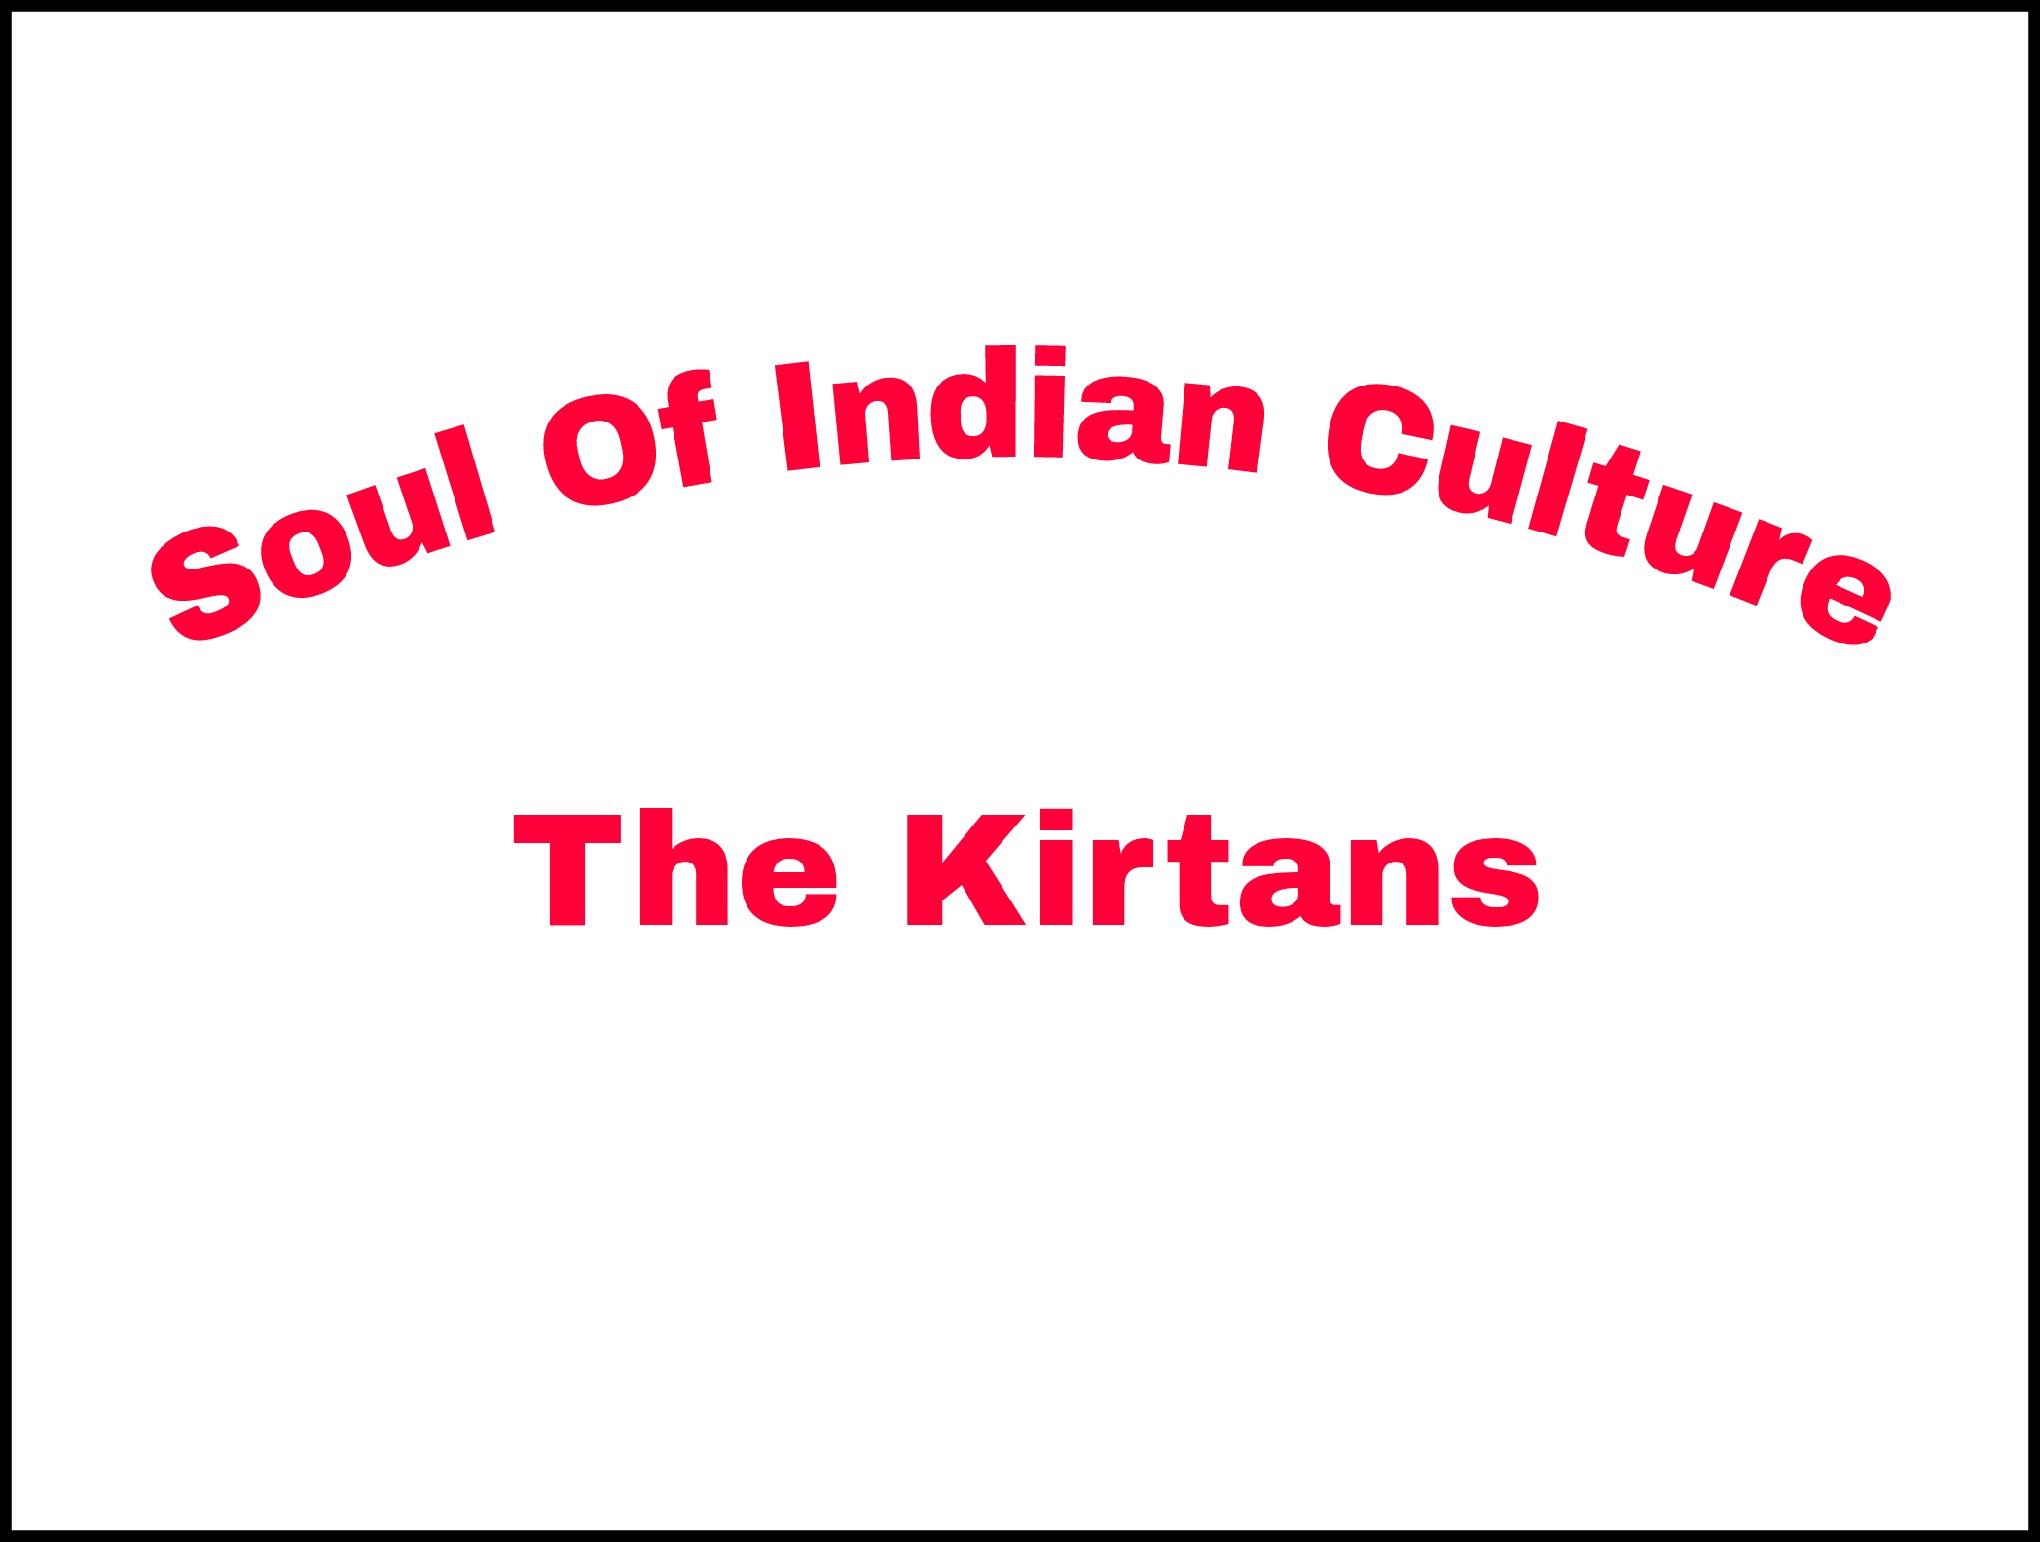 The Kirtans